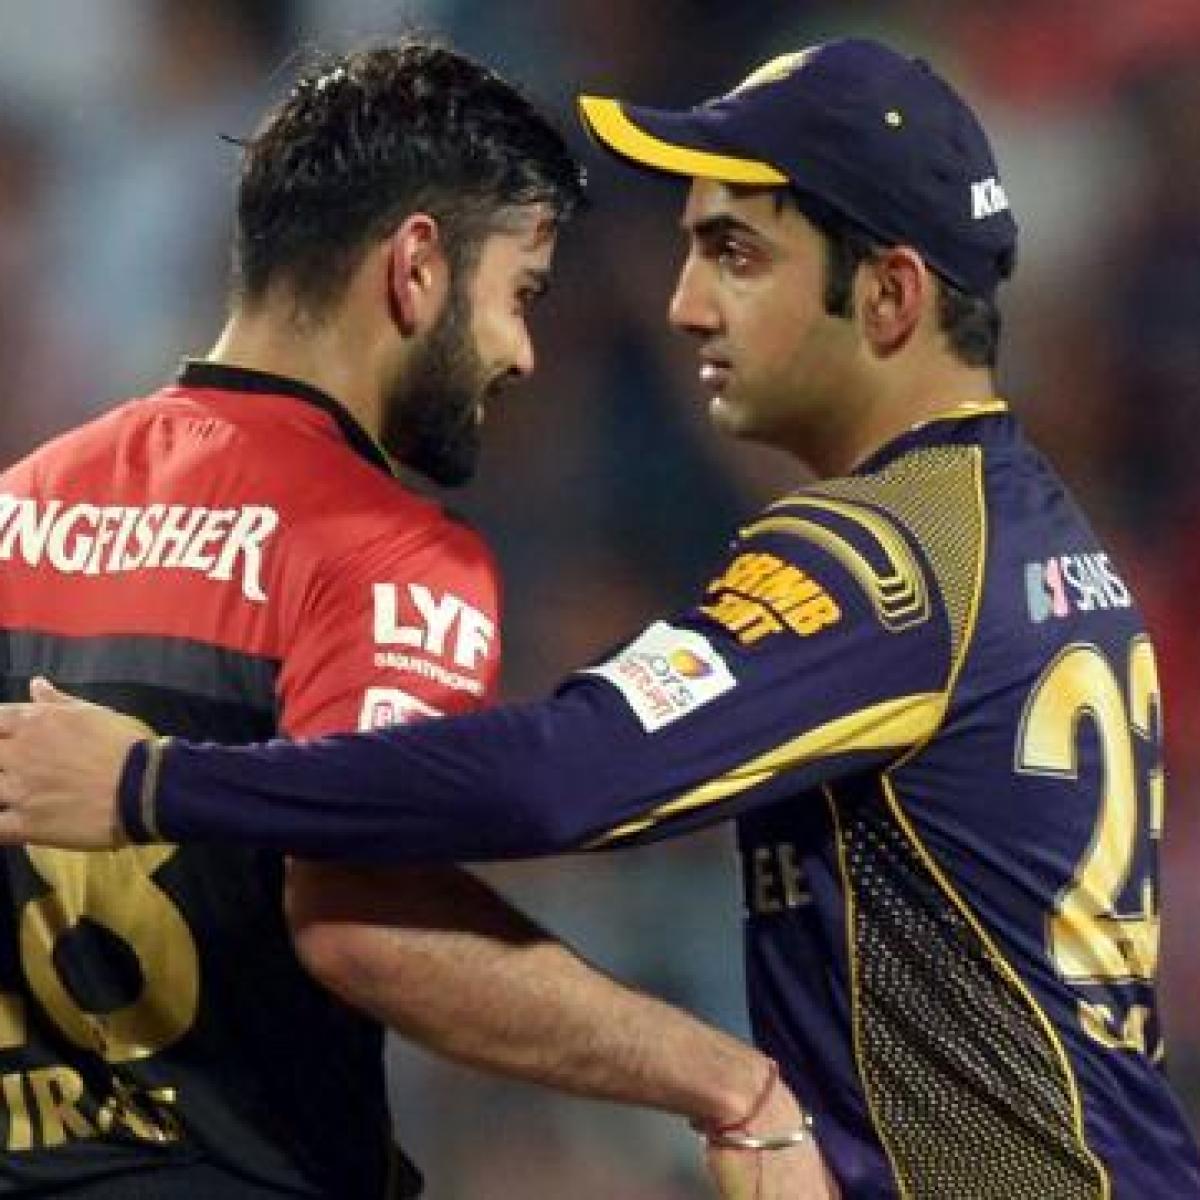 Ind vs Aus: Gautam Gambhir criticises Virat Kohli for 'T20' type of captaincy in 2nd ODI